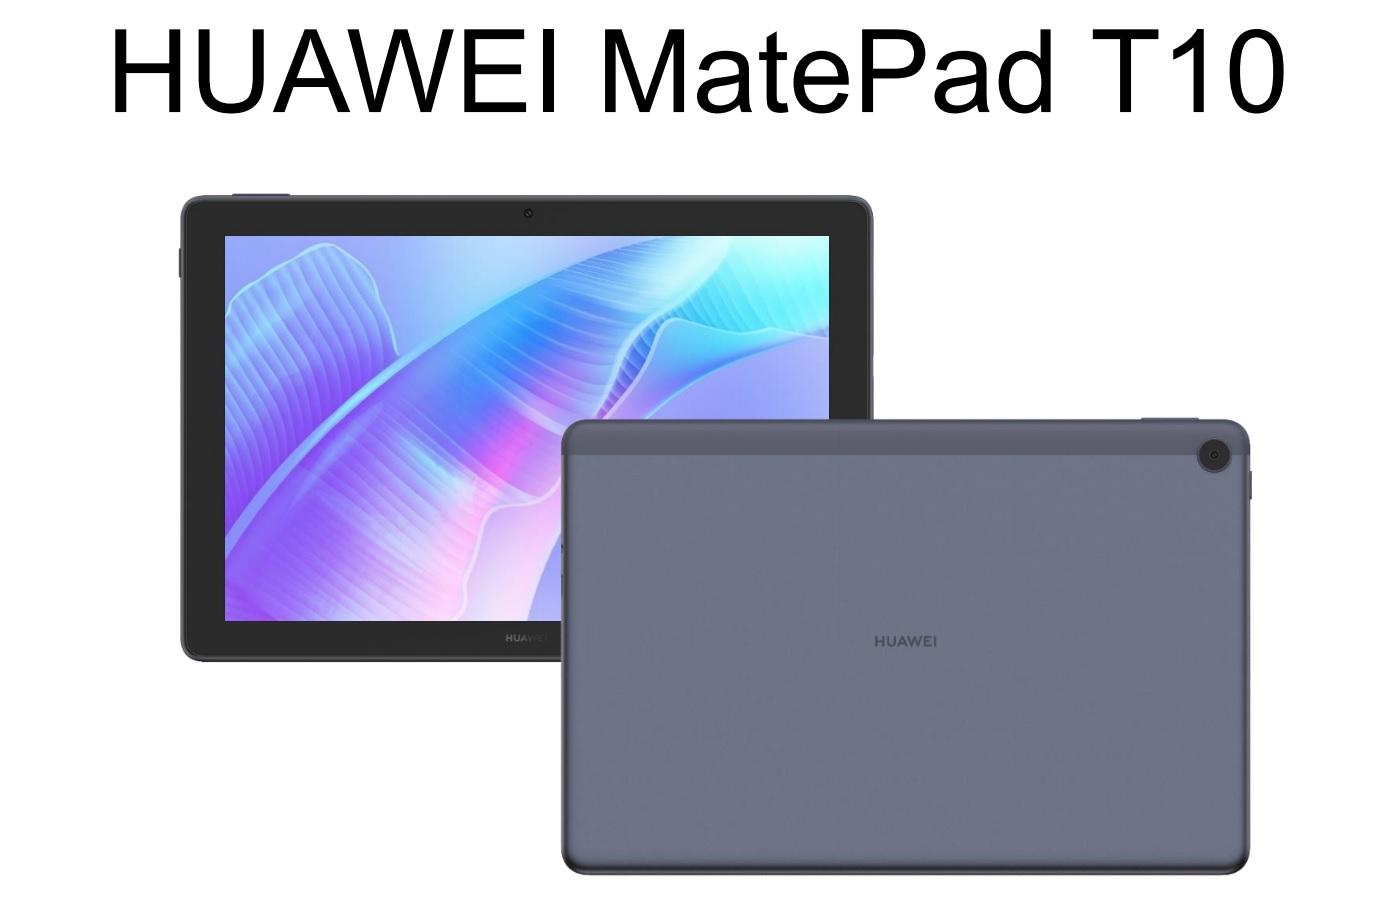 tablet Huawei MatePad T10